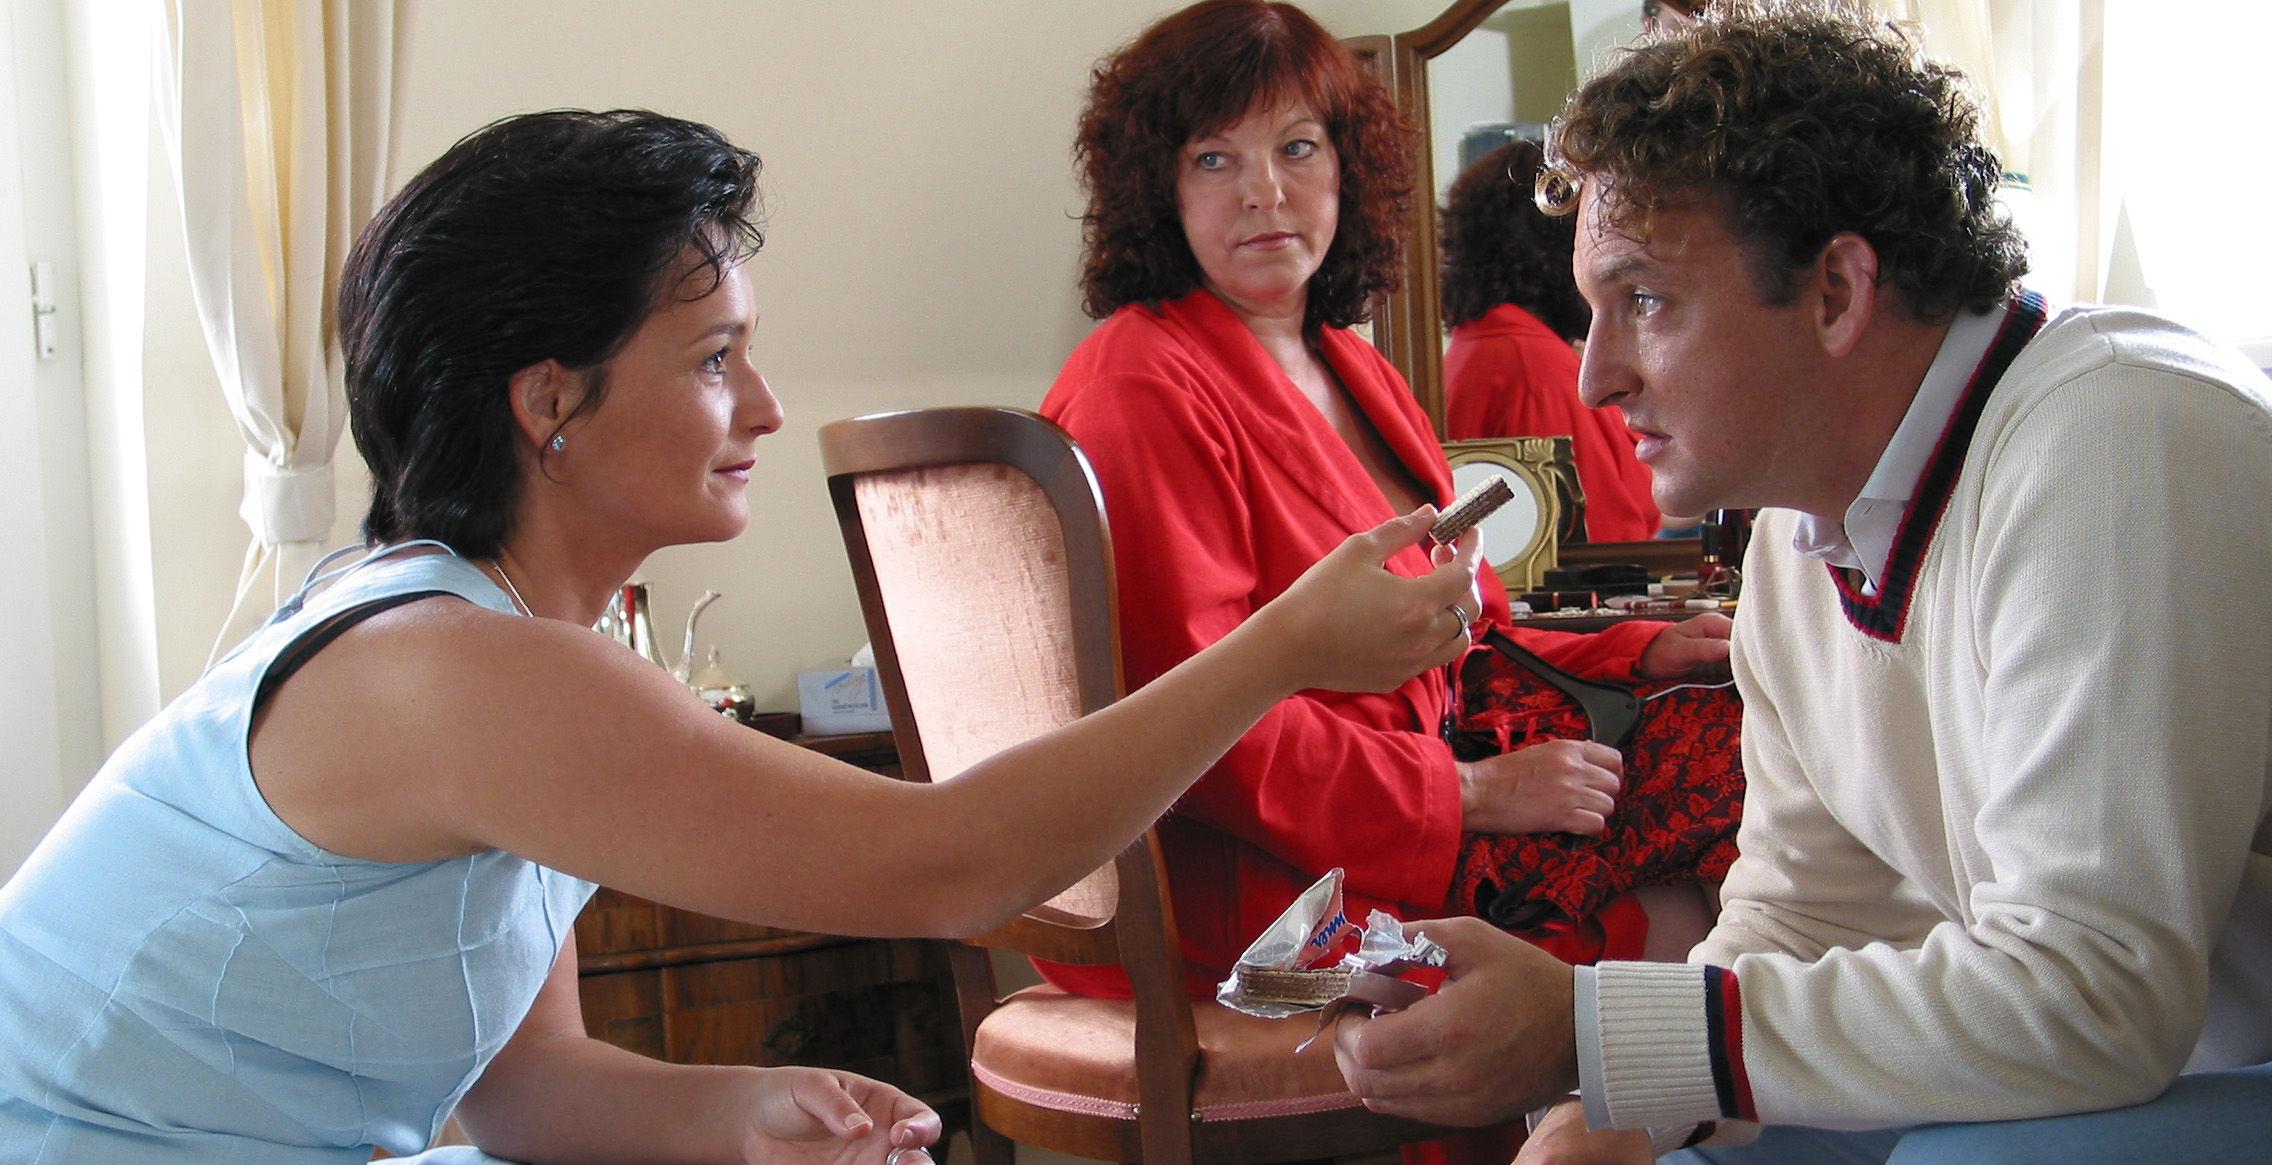 Diana (Katharina Stemberger), Conny (Elfi Eschke), Freddy (Marco Rima)